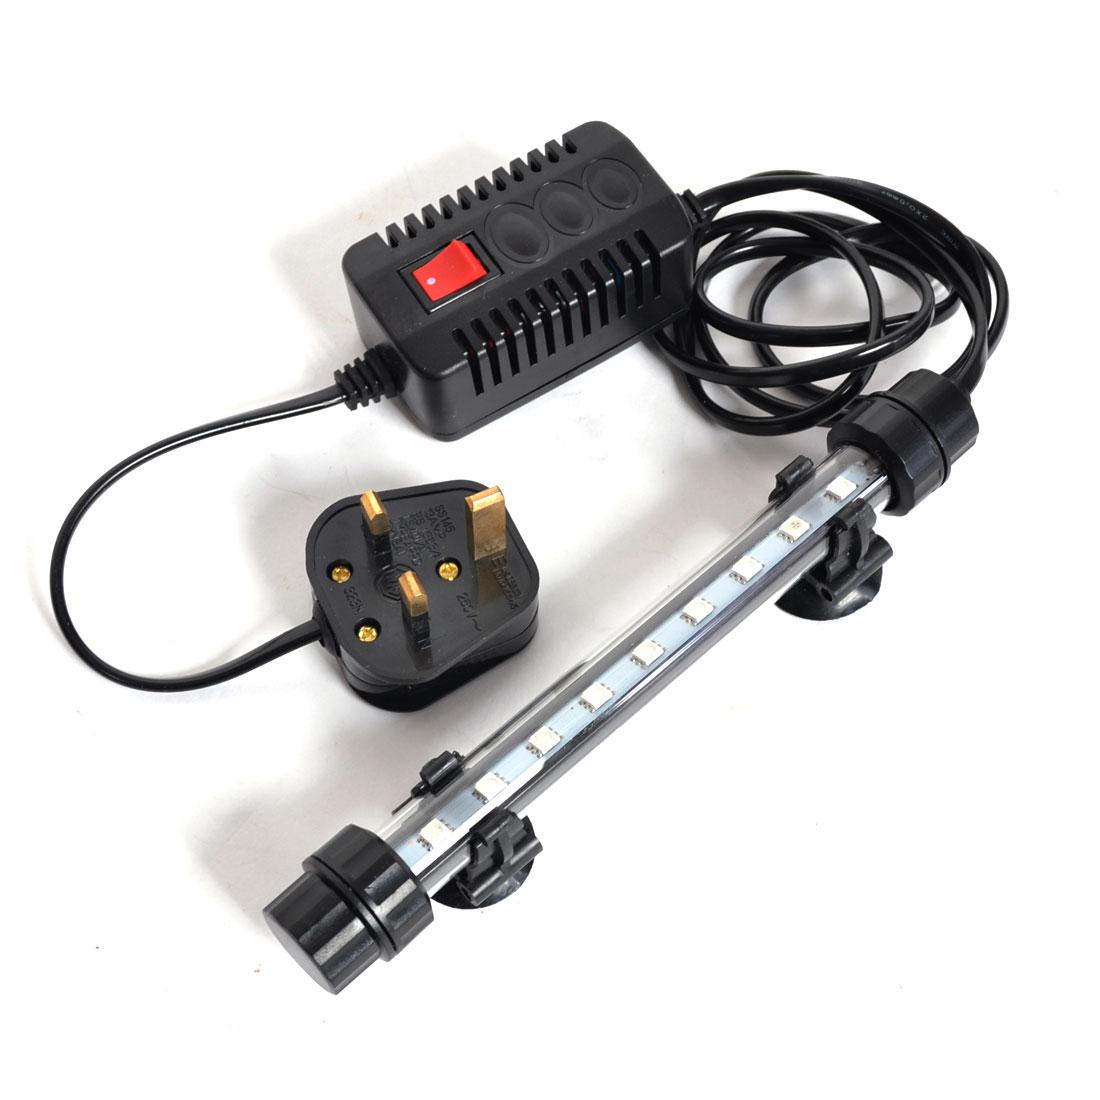 AC 220V-240V UK Plug Aquarium 9 SMD LEDs Blue Light Submersible Lamp